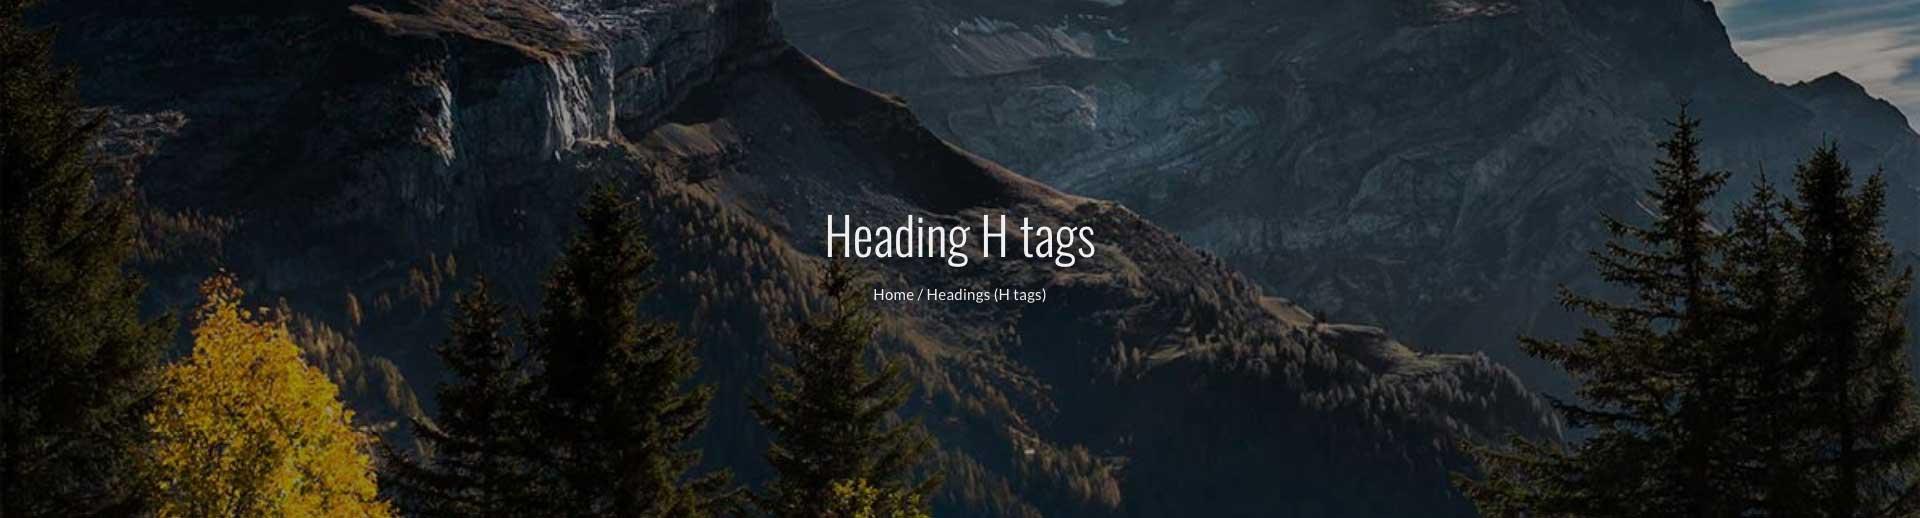 page-header-breadcrumb